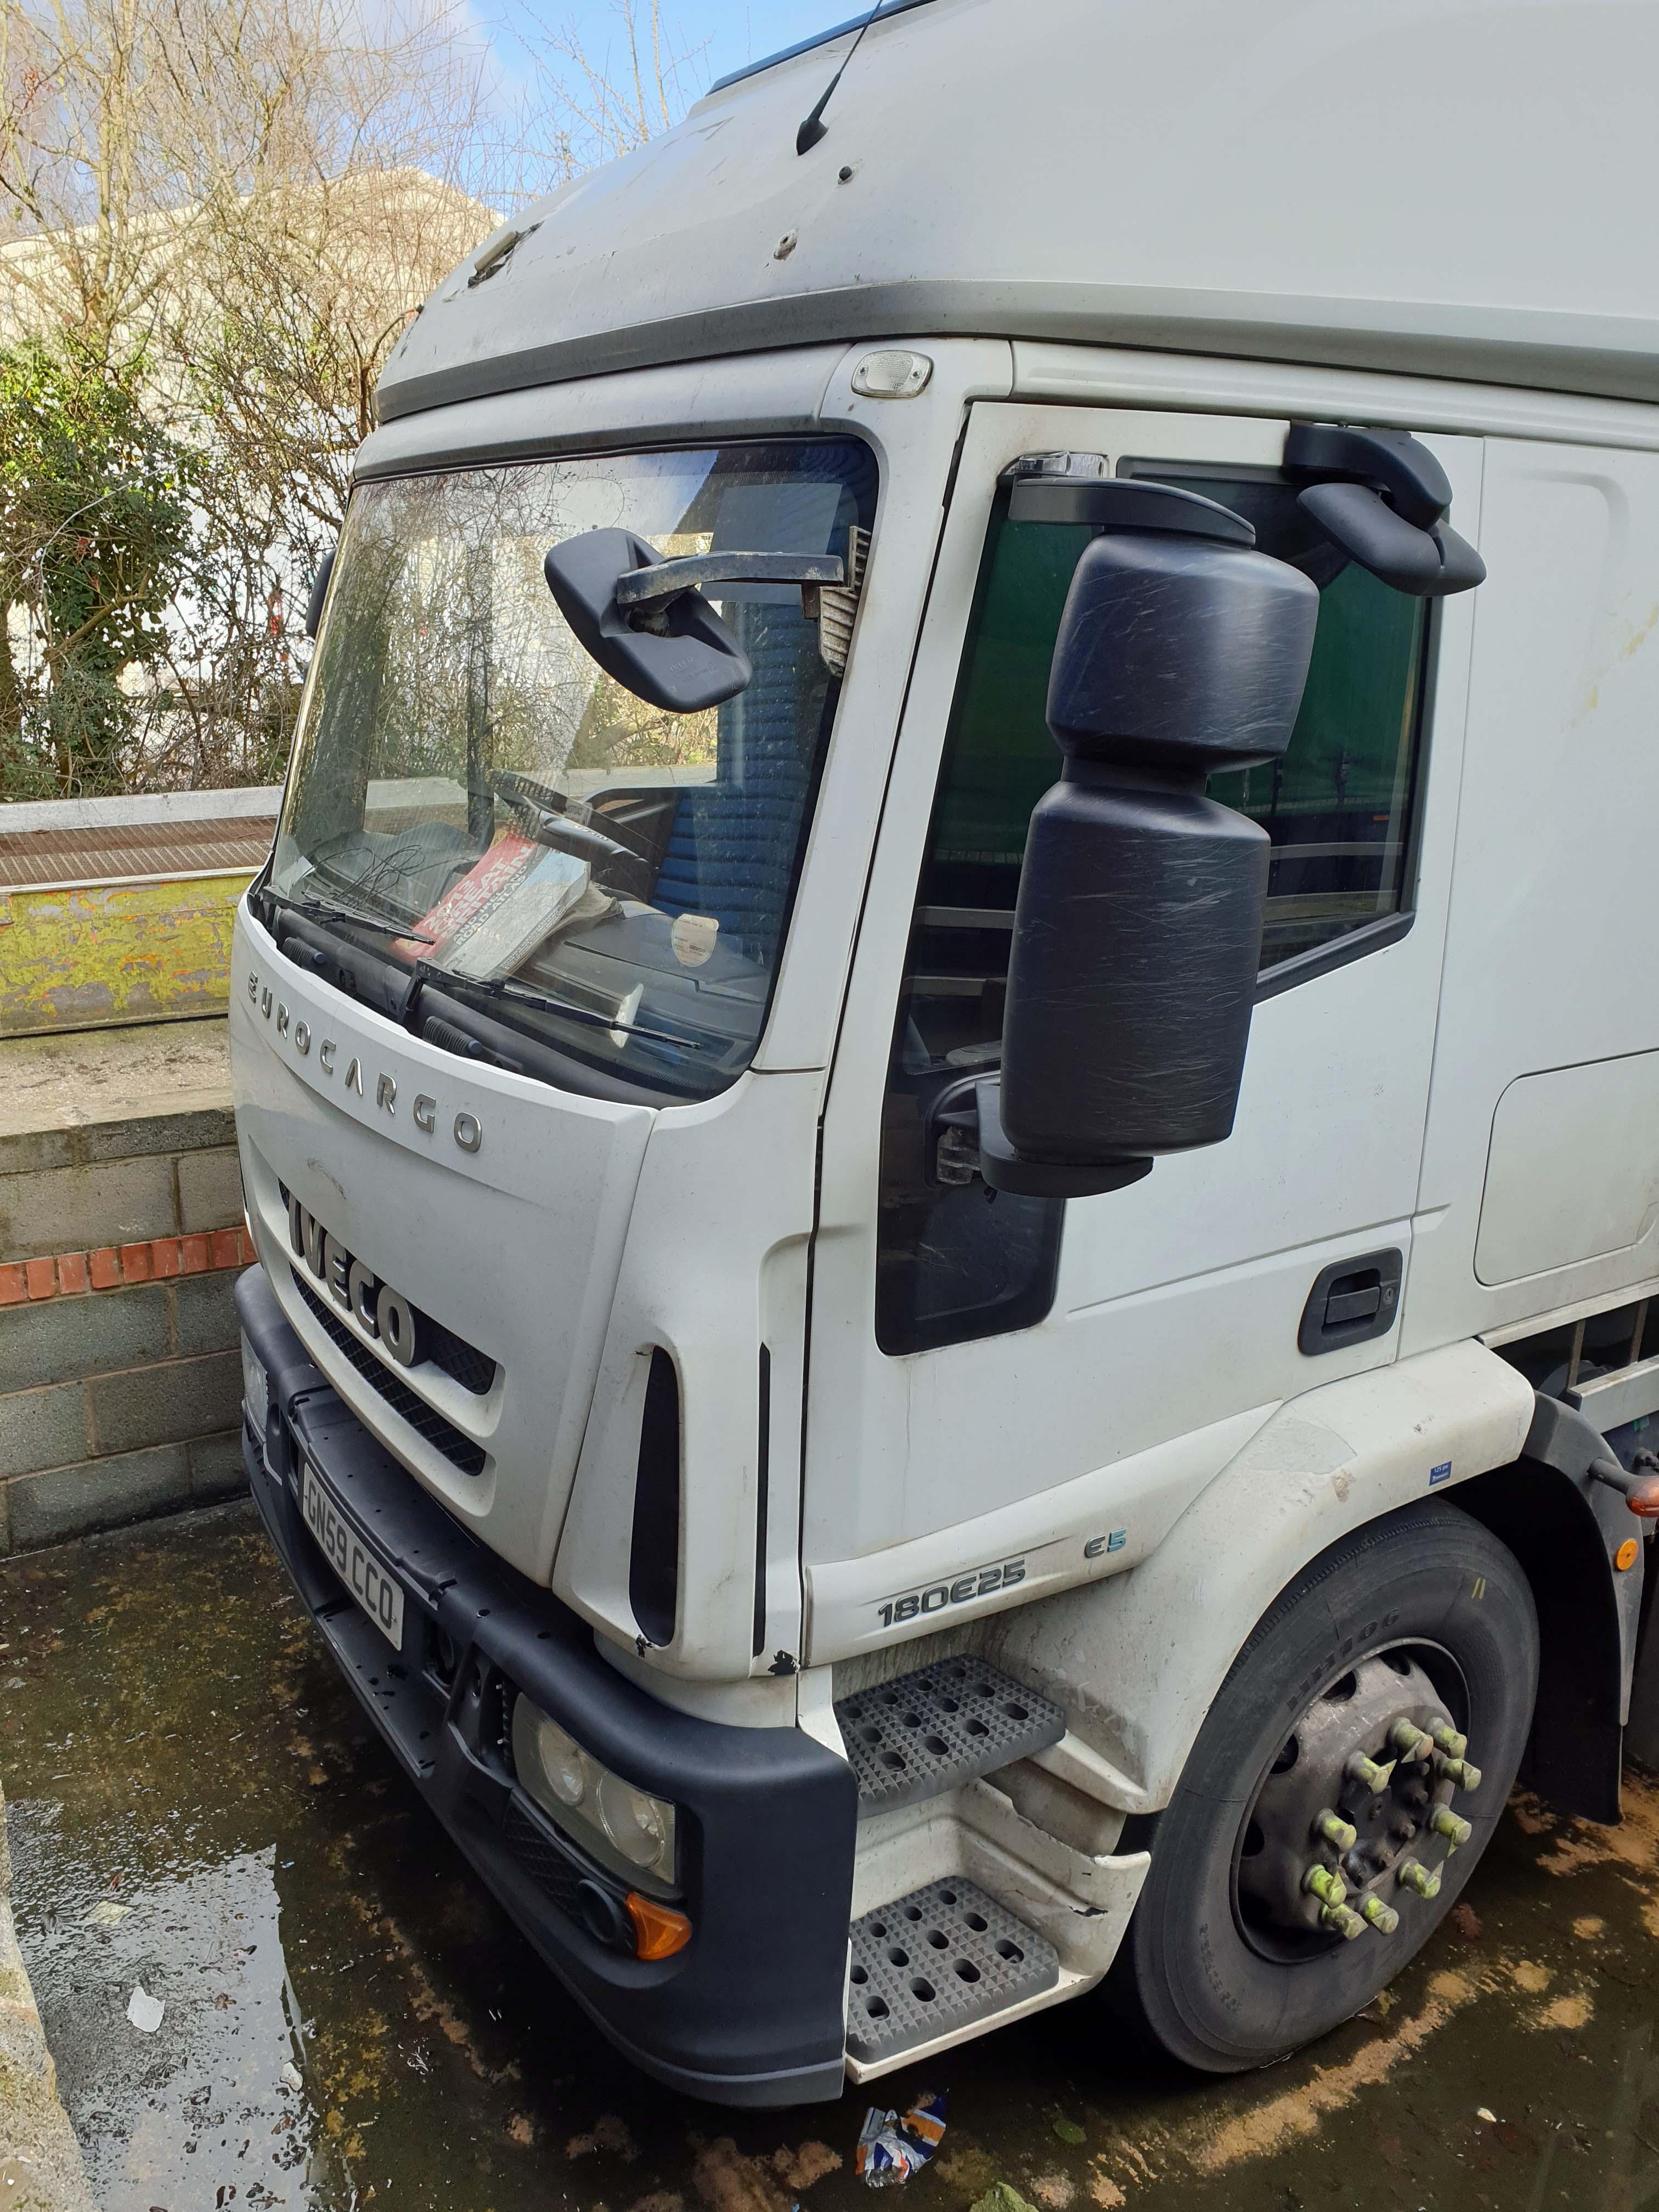 An IVECO Cargo ML 180E25 5880cc Euro5 4x2 18-Tonne Curtainside Truck, Registration No. GN59 CCO,